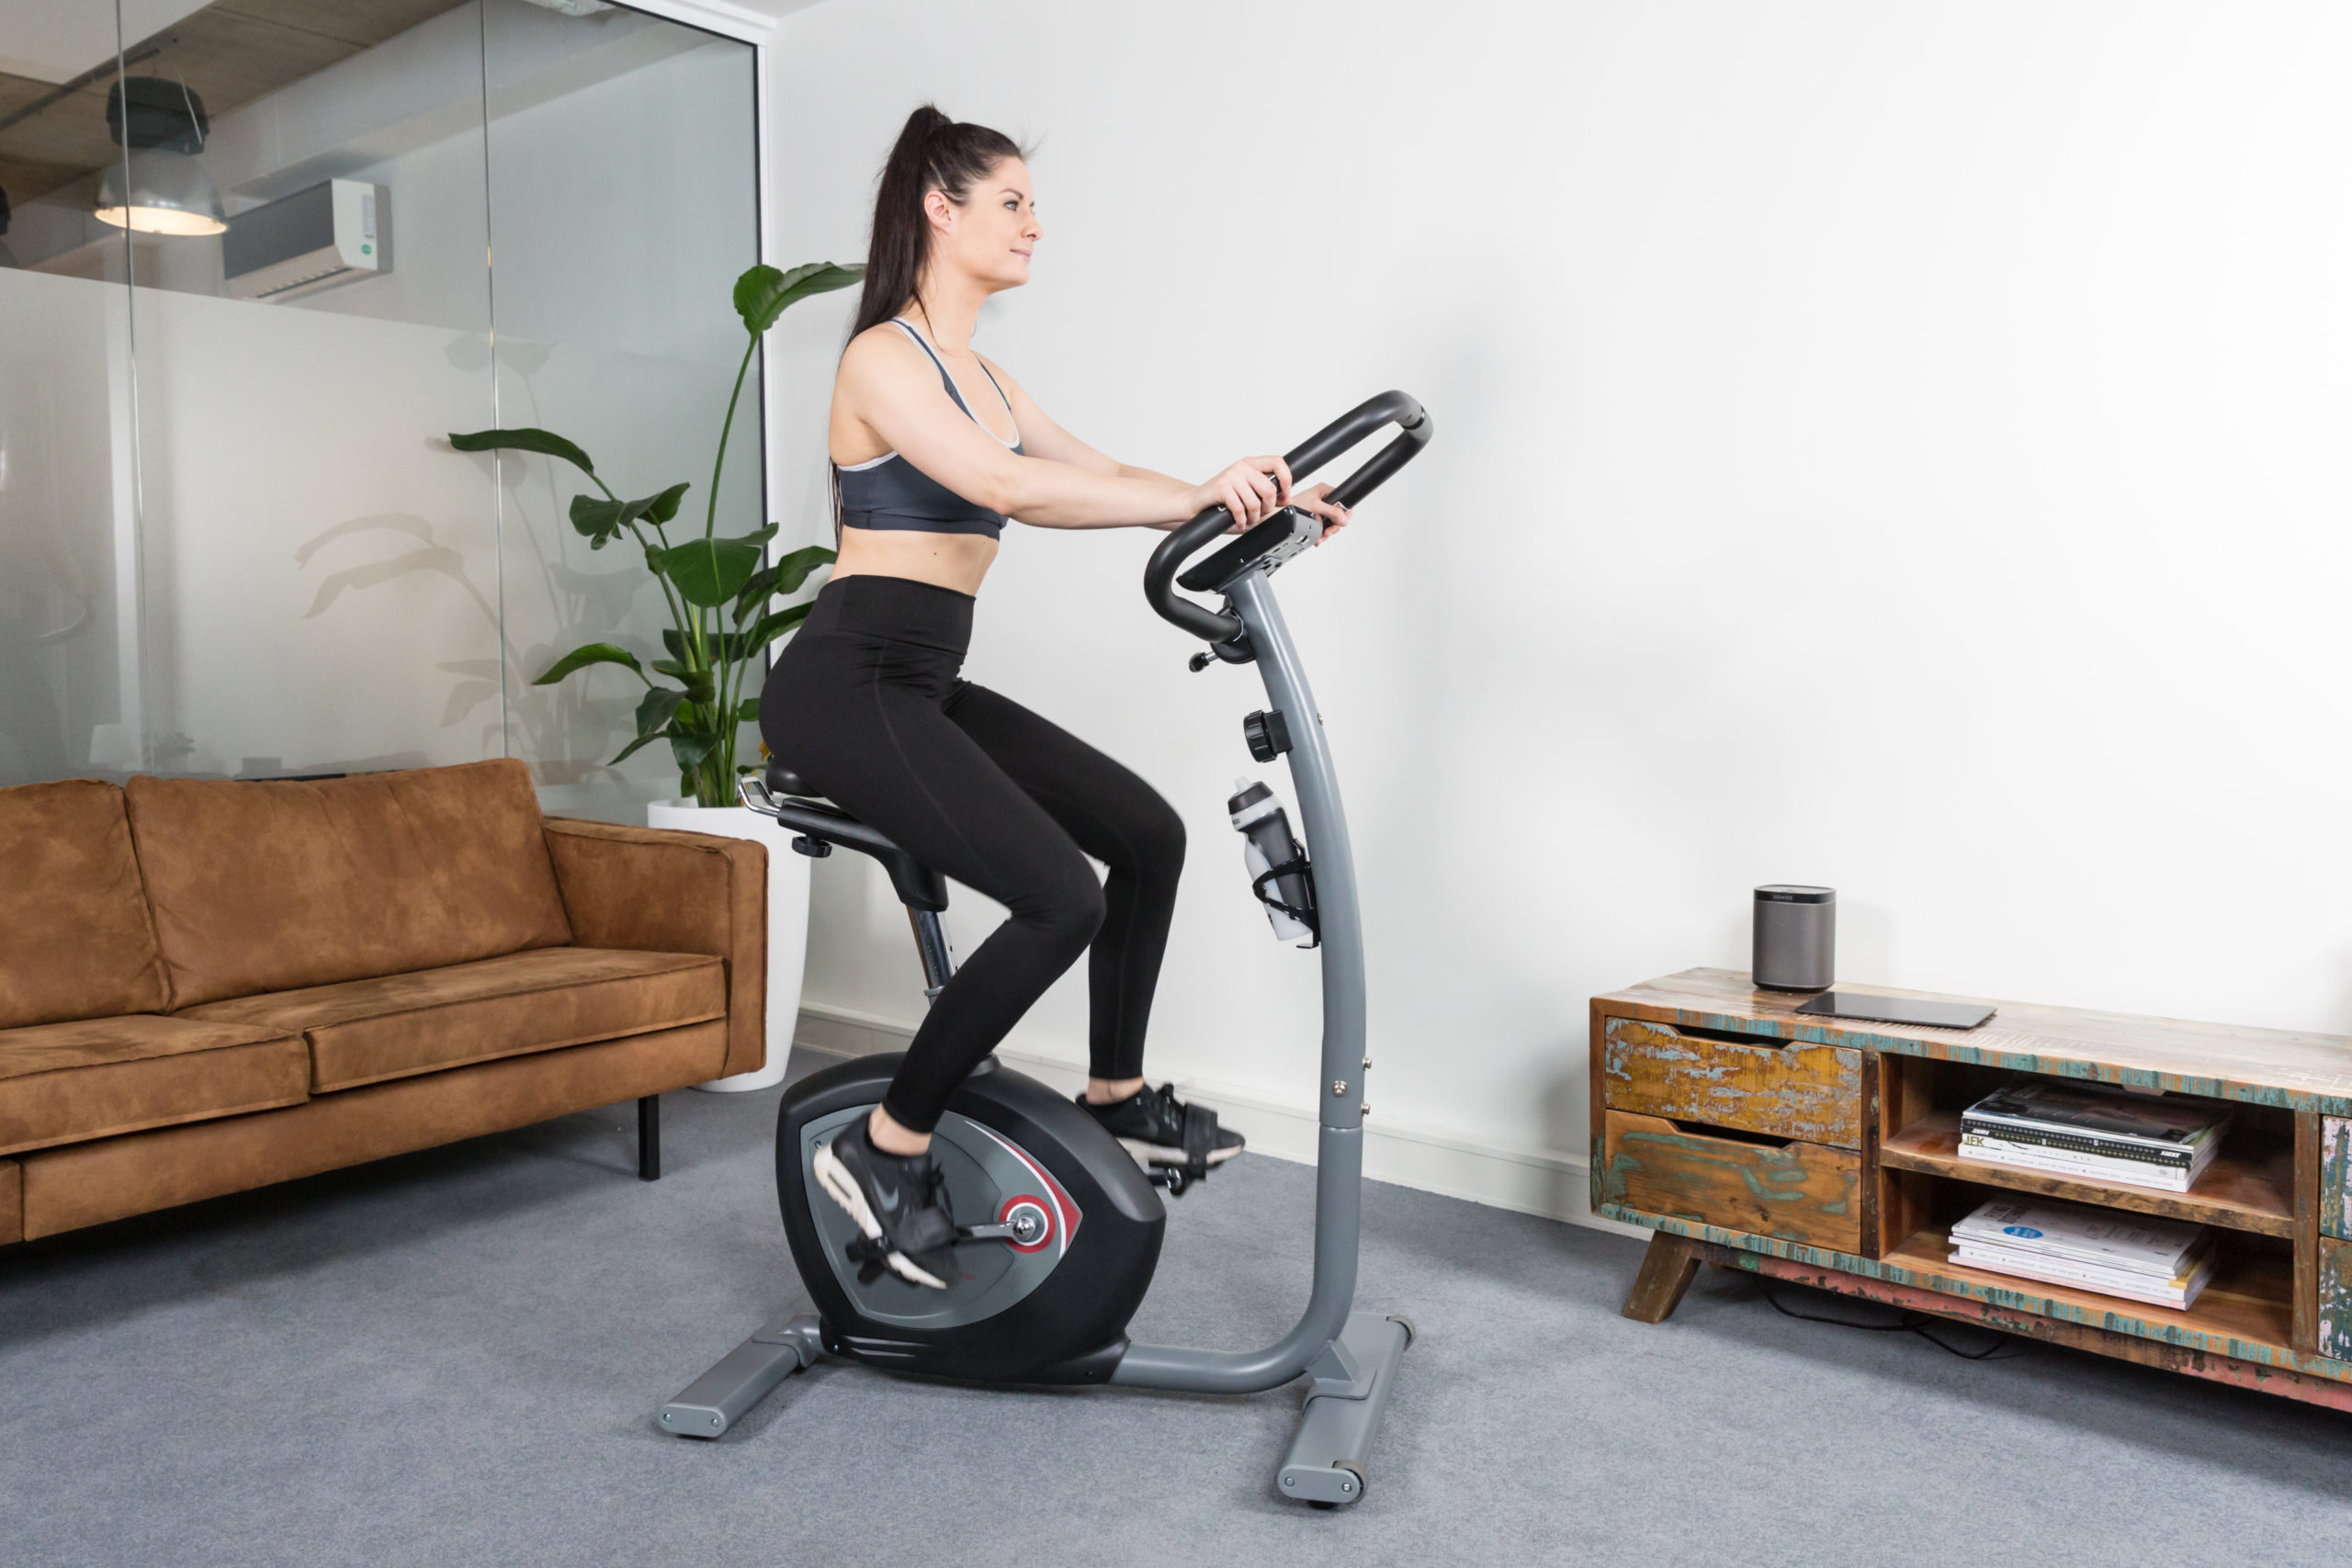 Flow Fitness Tabel Turner DHT500 Hometrainer 10